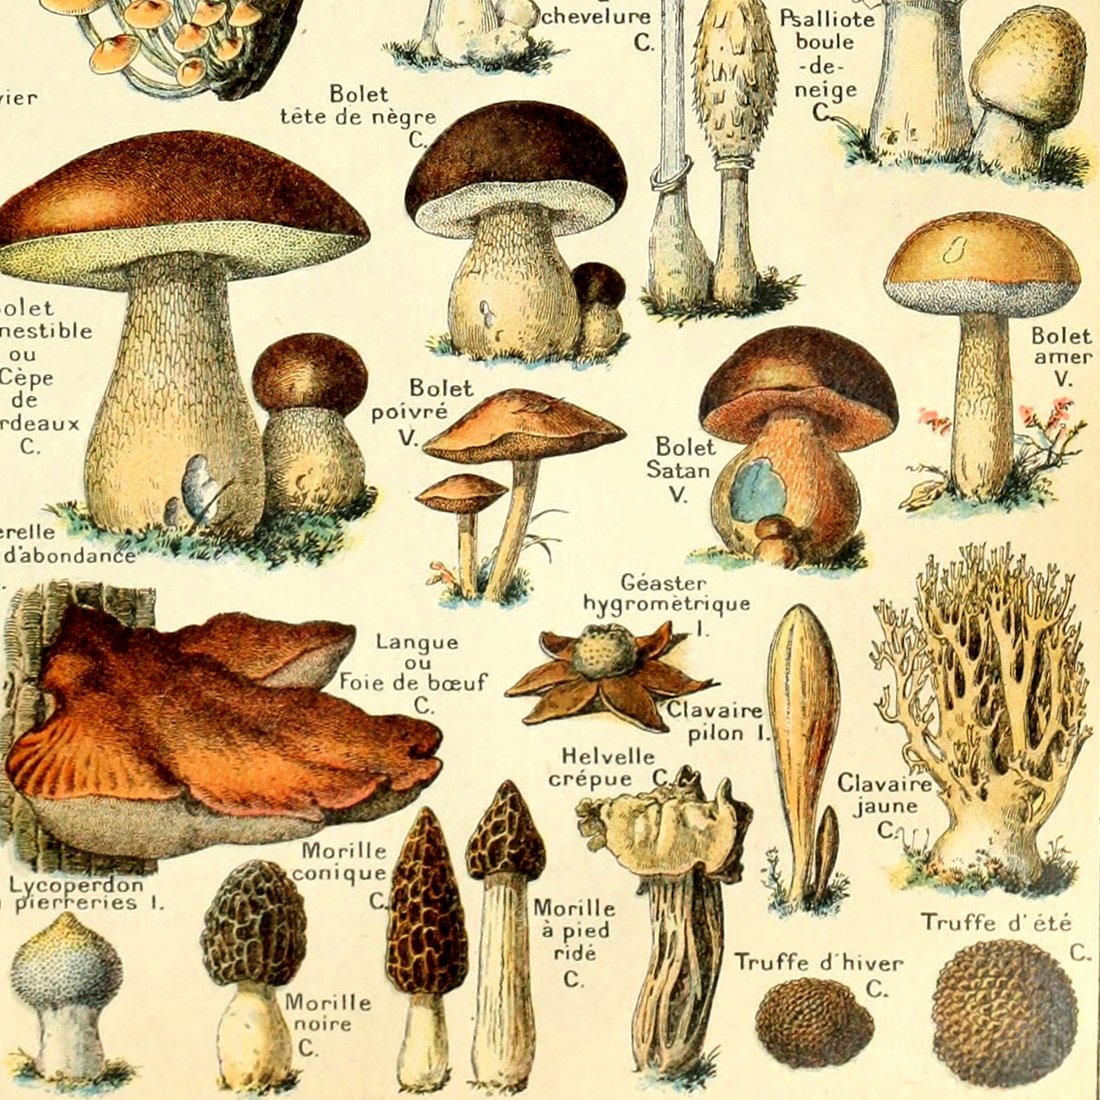 Meishe Art Jahrgang Plakate Drucken Plakatdruck Pilze Champignons Identifizierung Bezug Abbildung Illustrationen Botanische P/ädagogische Wand Dekor 12.99 x 19.69